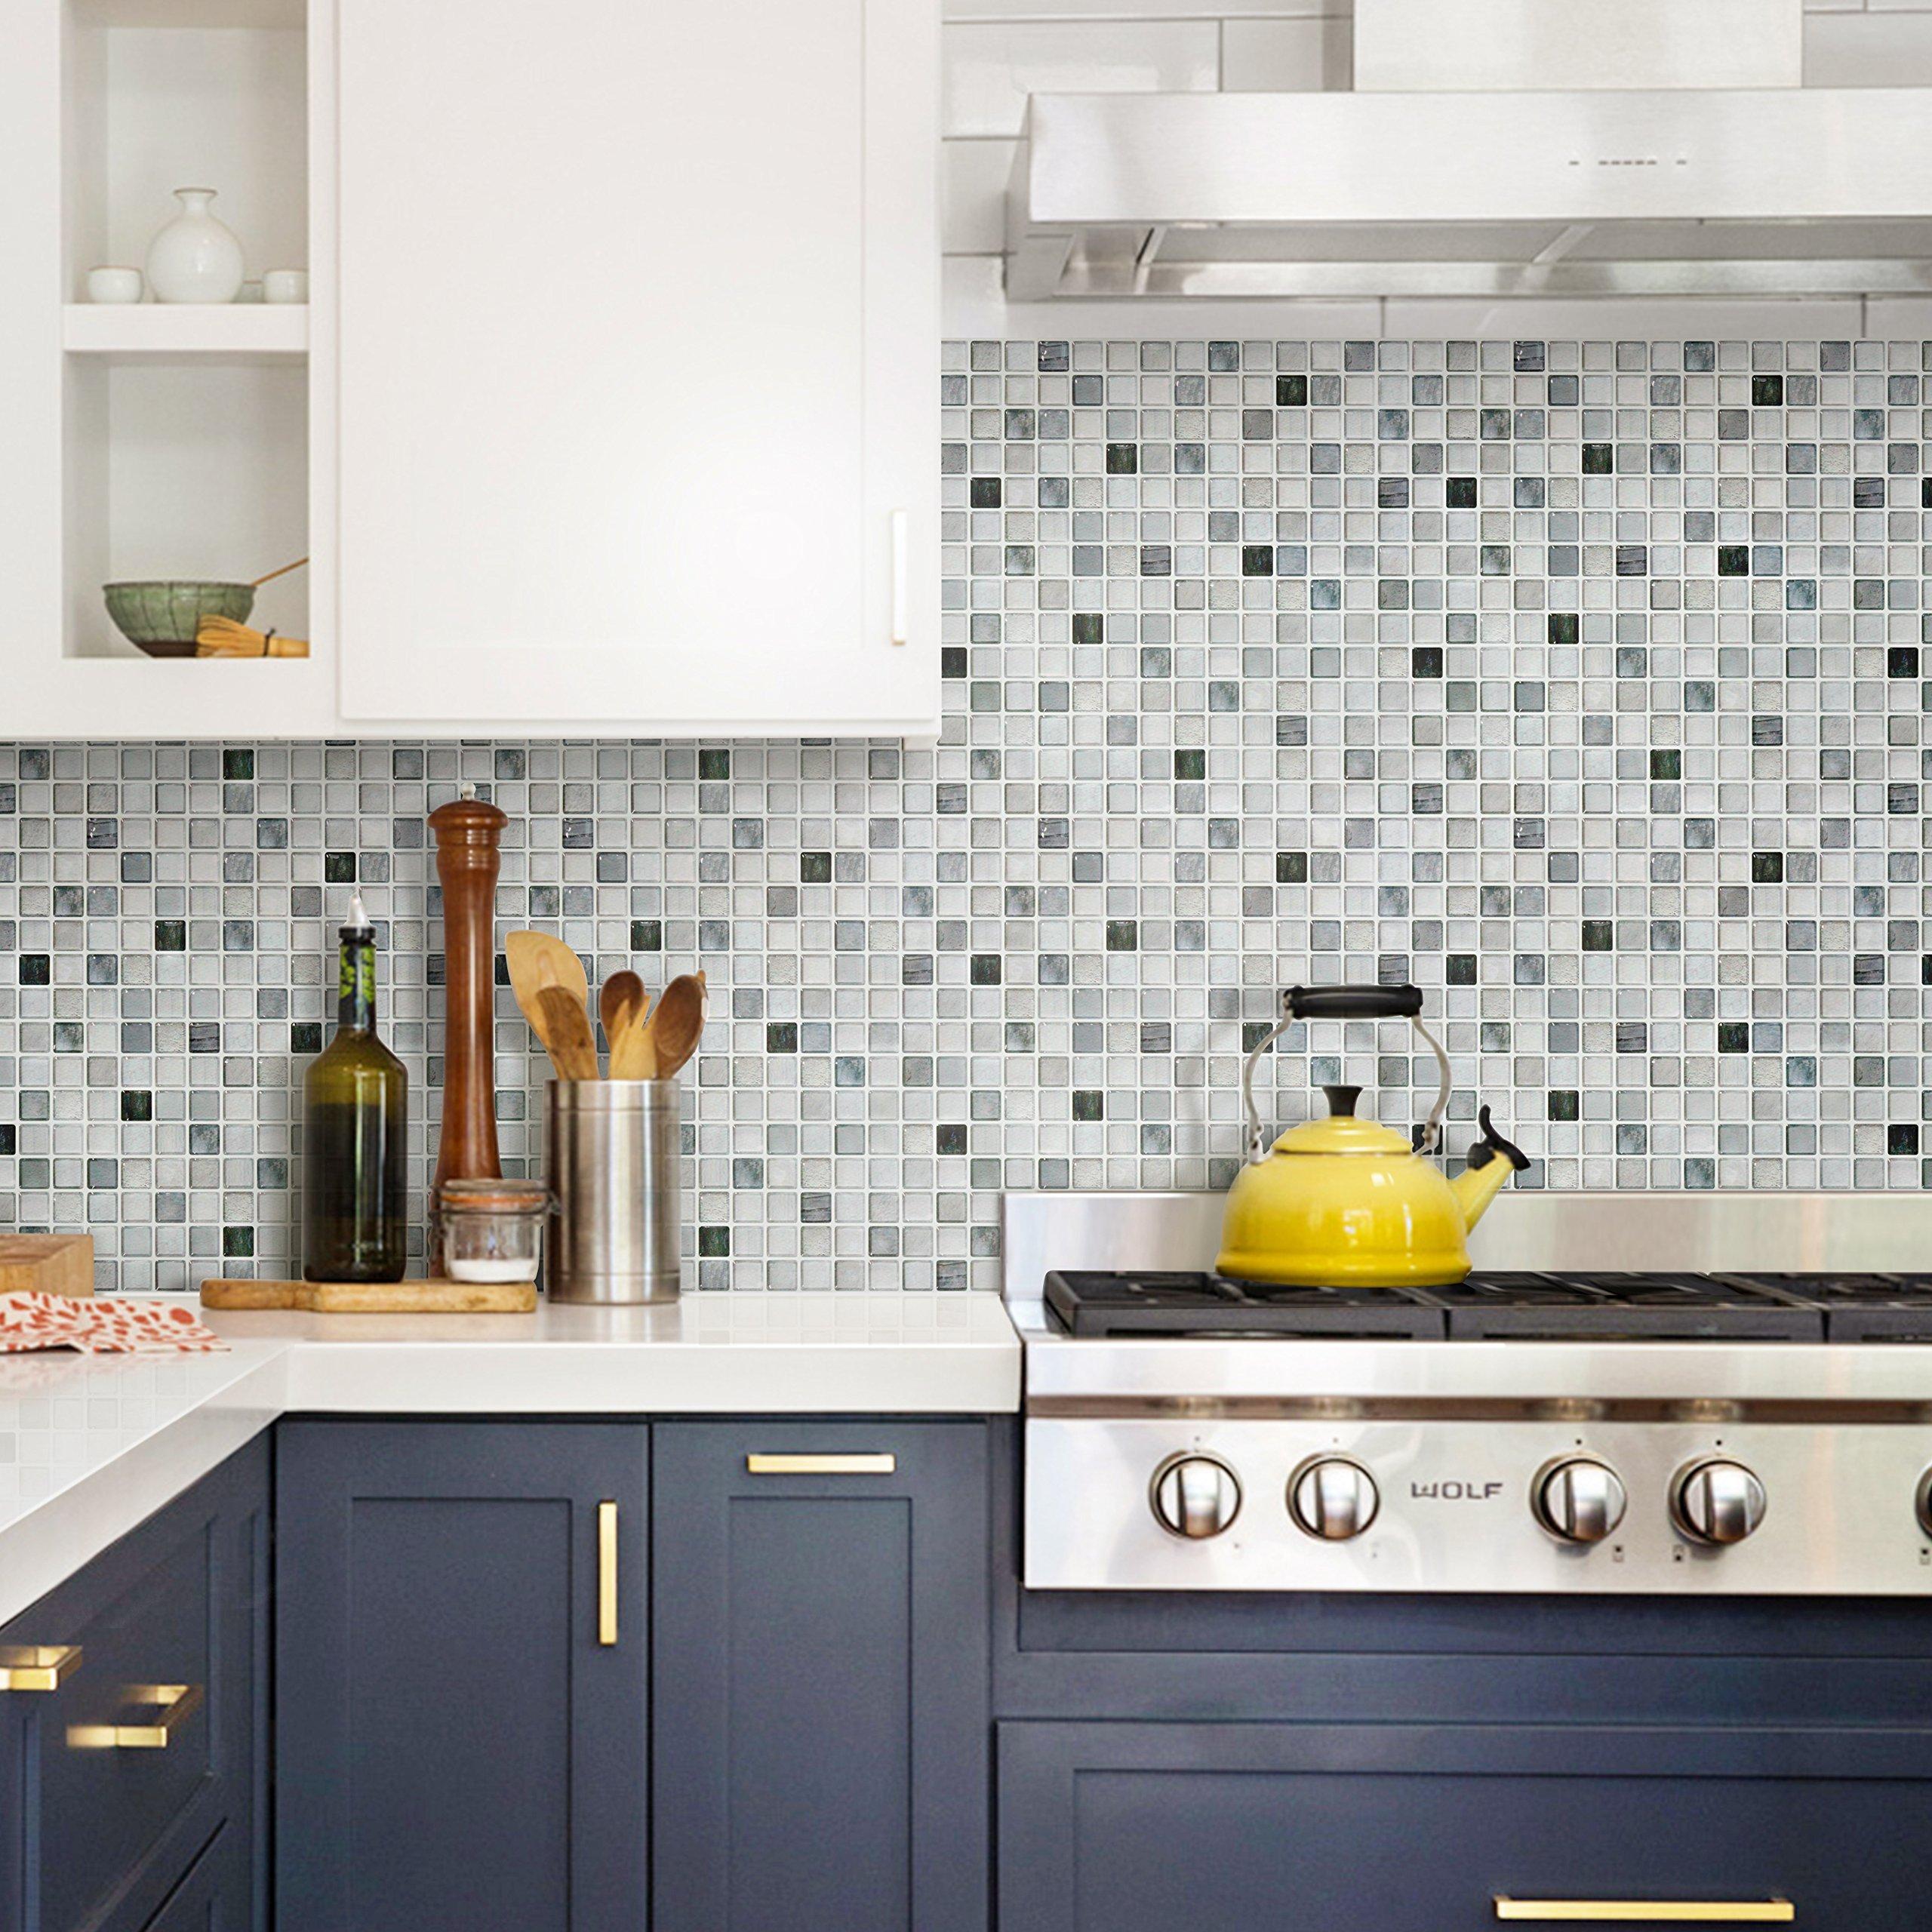 BEAUSTILE Decorative Tile Stickers Peel Stick Backsplash Fire Retardant Tile Sheet (Monocrome) (10, 12.2'' x 12.2'') by BEAUS TILE (Image #7)